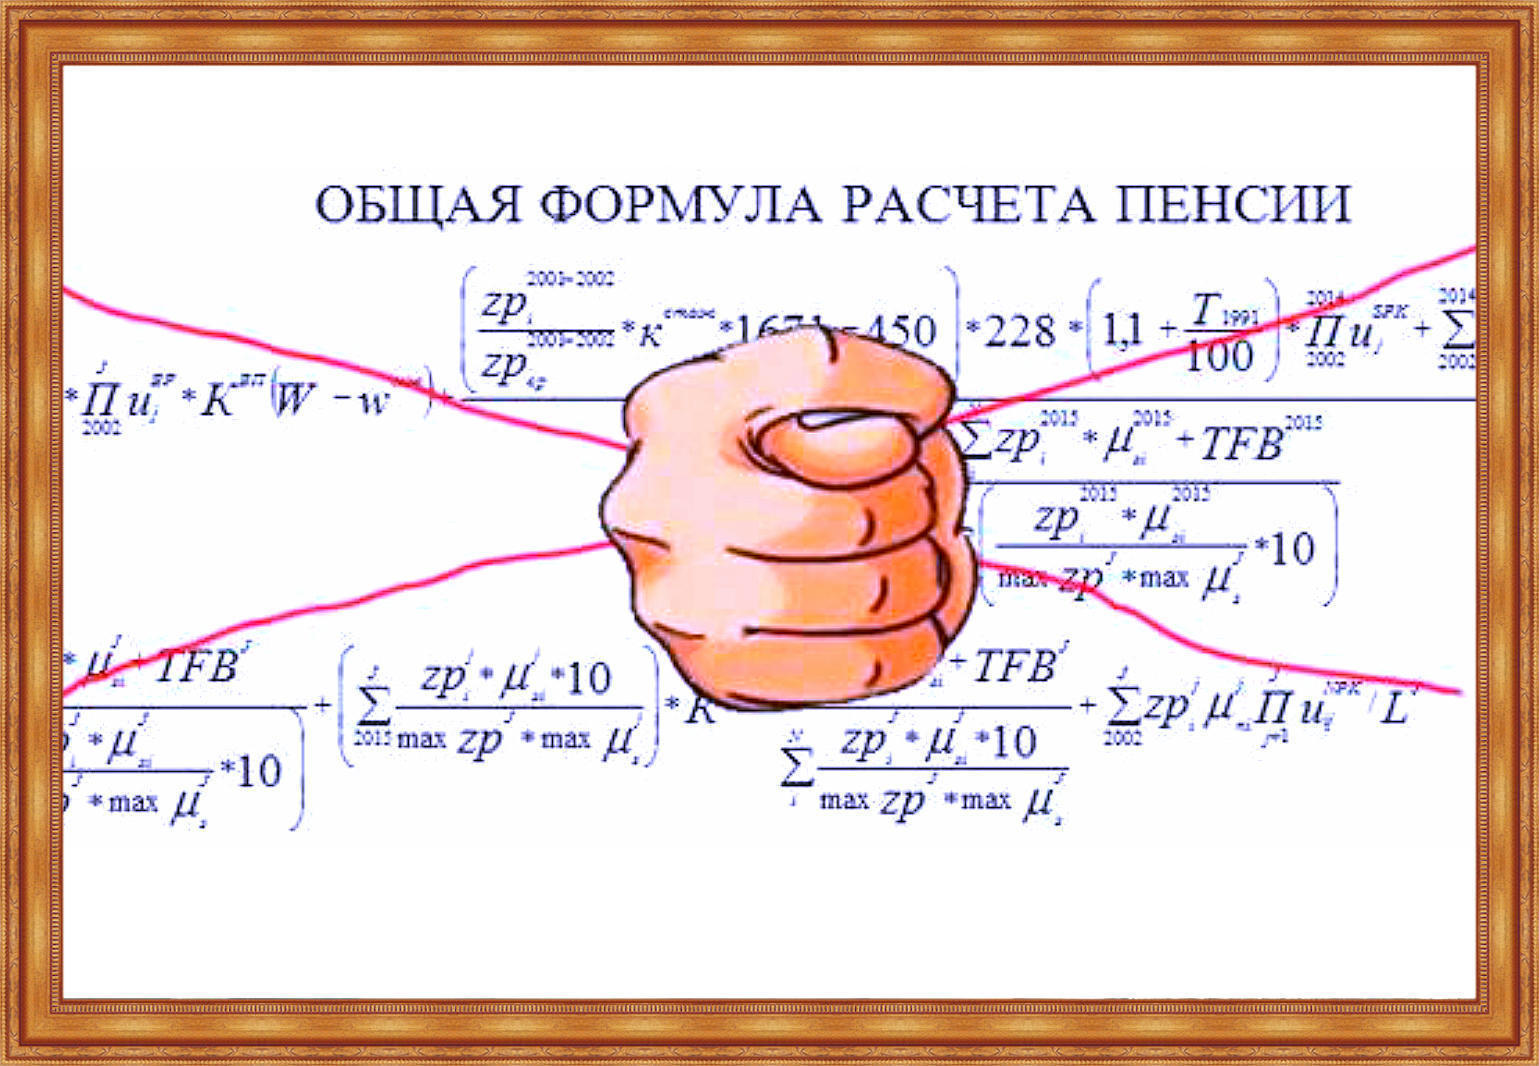 Рева представил Турчинову законопроект о перерасчете пенсий военным - Цензор.НЕТ 9132